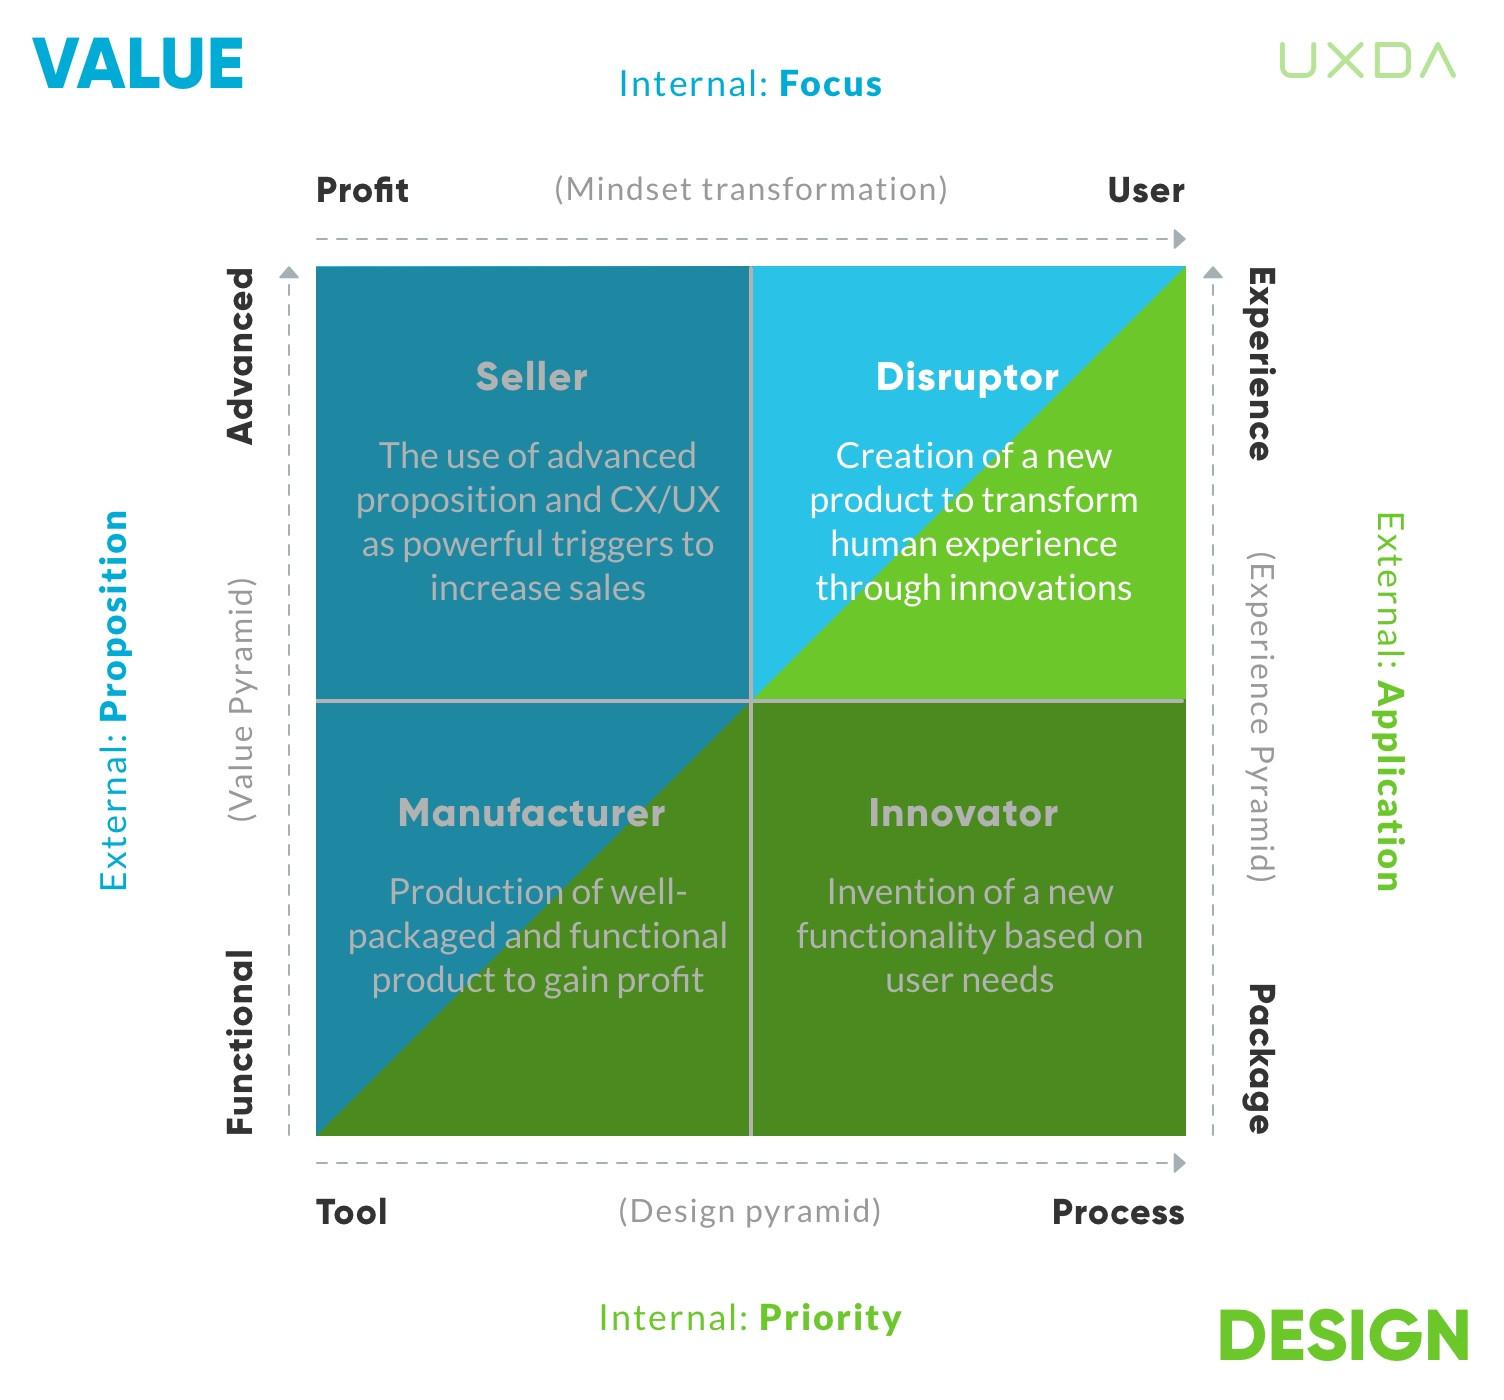 financial-design-matrix-for-banking-disruption-7.jpg